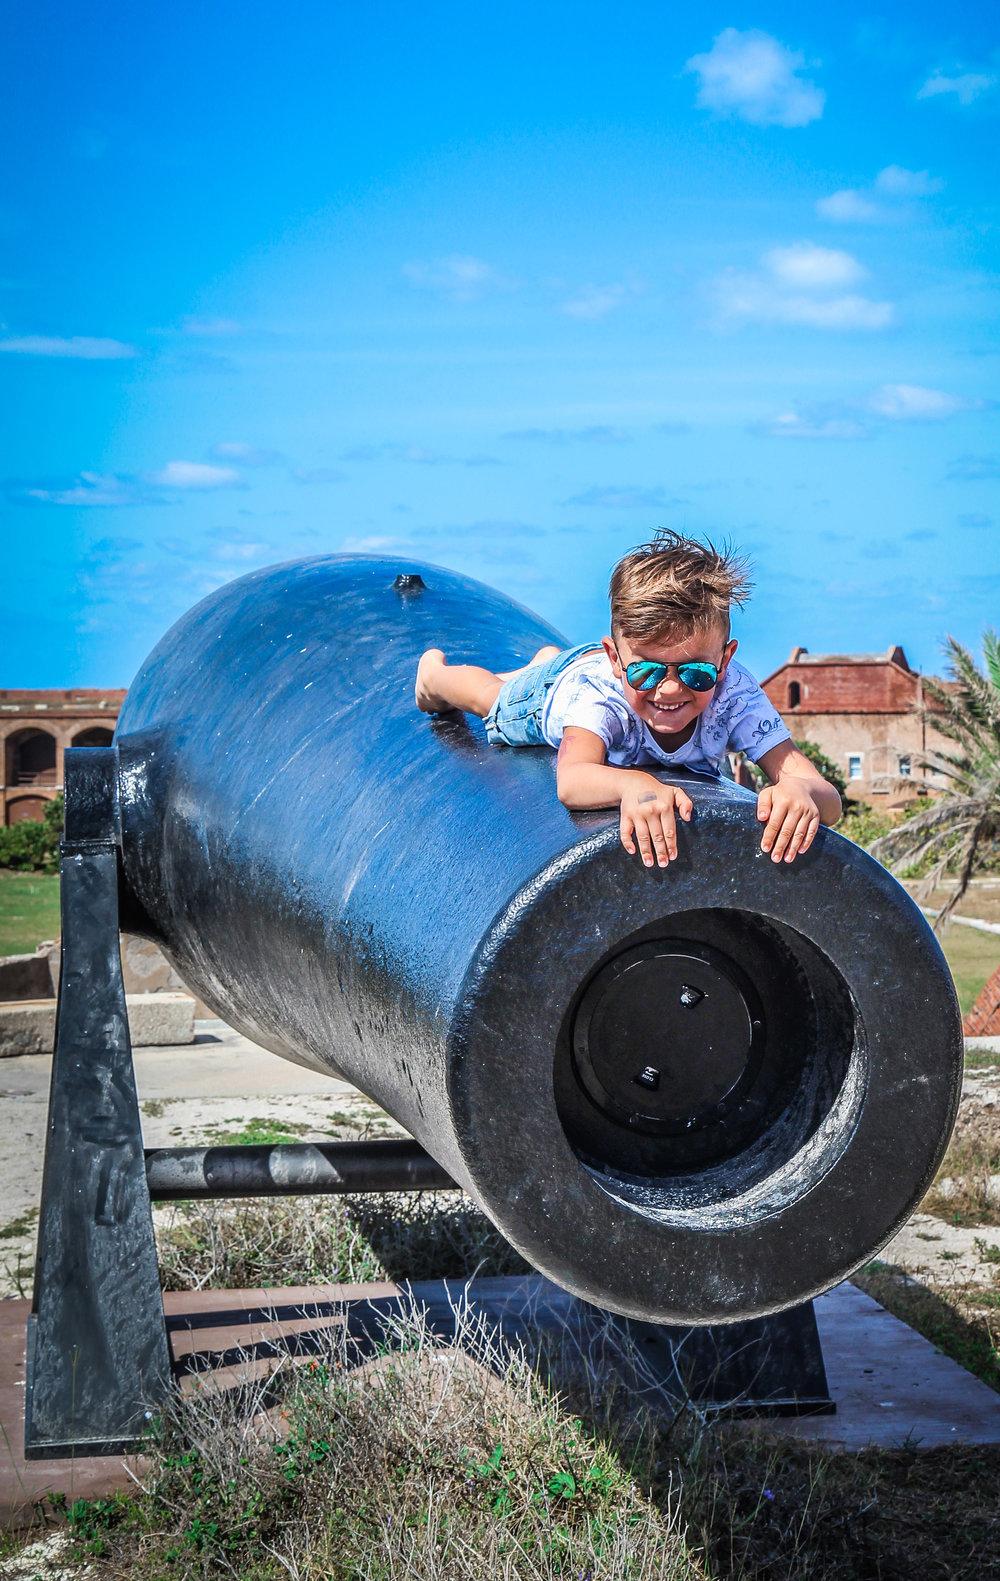 Key_west_Dry_tortugas_Yankee_freedom_Reizen_met_kinderen_Florida-5f.jpg